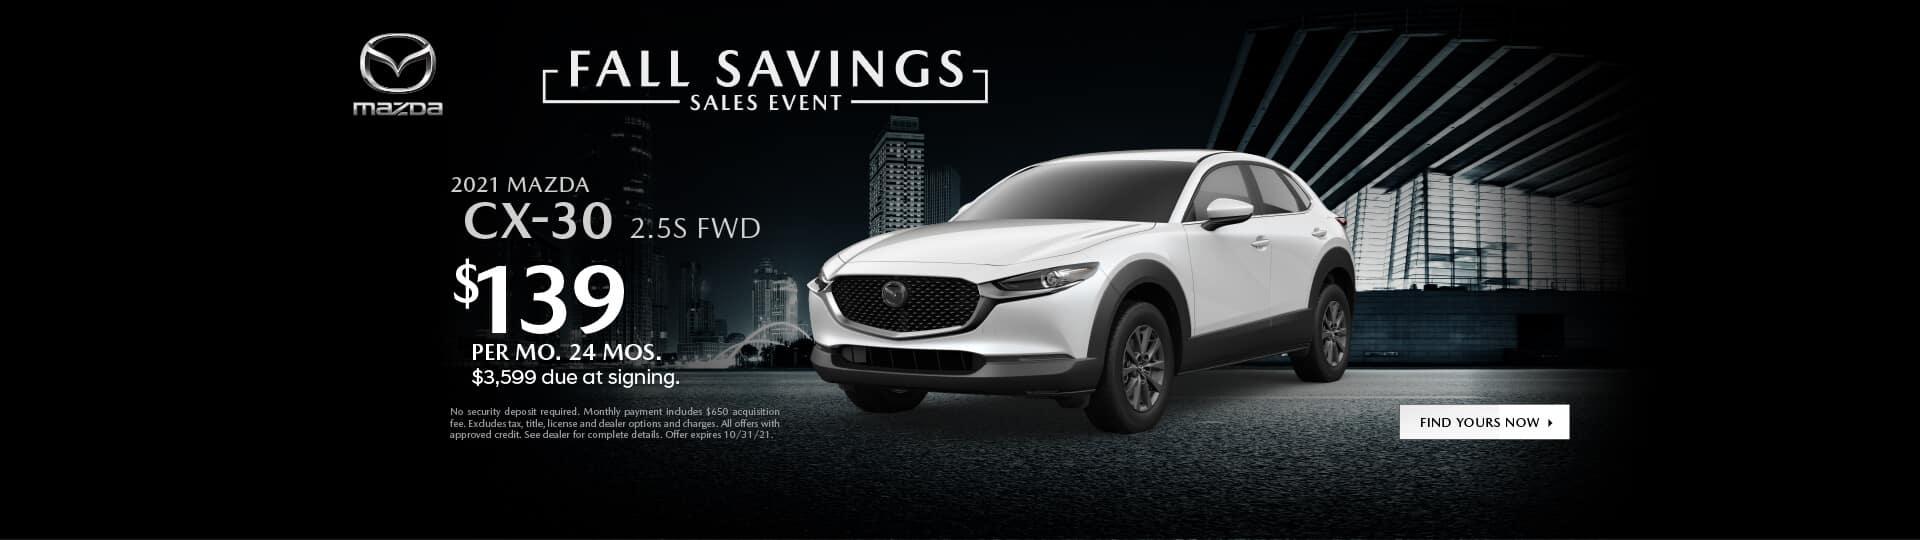 2021.10.06_Keffer-Mazda-OCT-Web_S54508ll-5